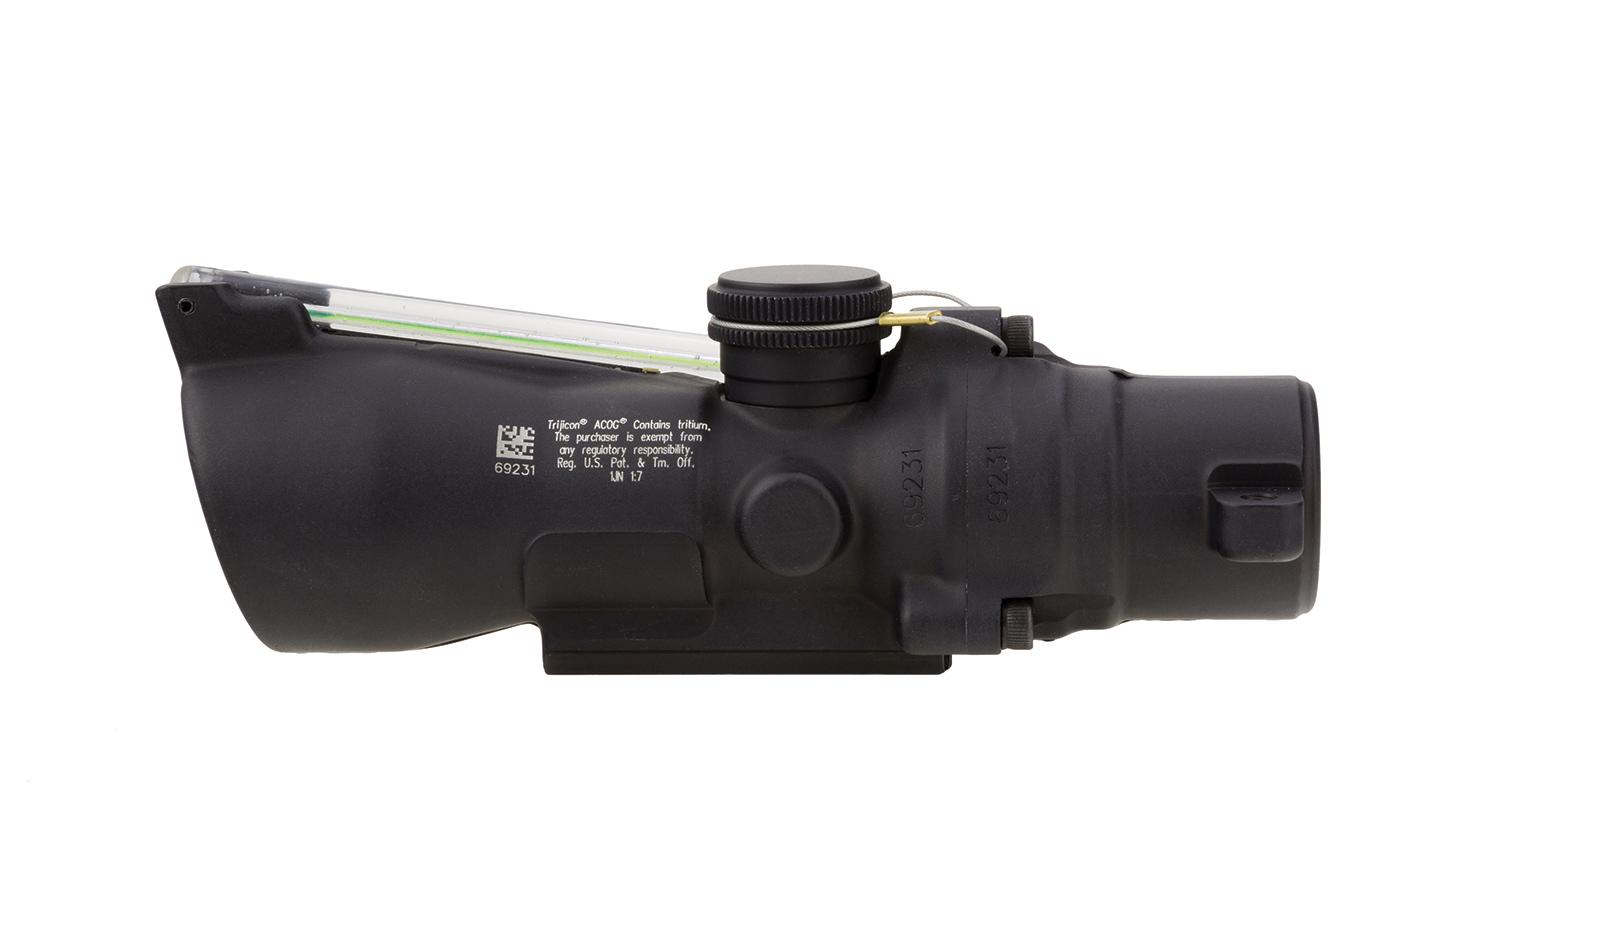 TA50-C-400237 angle 2